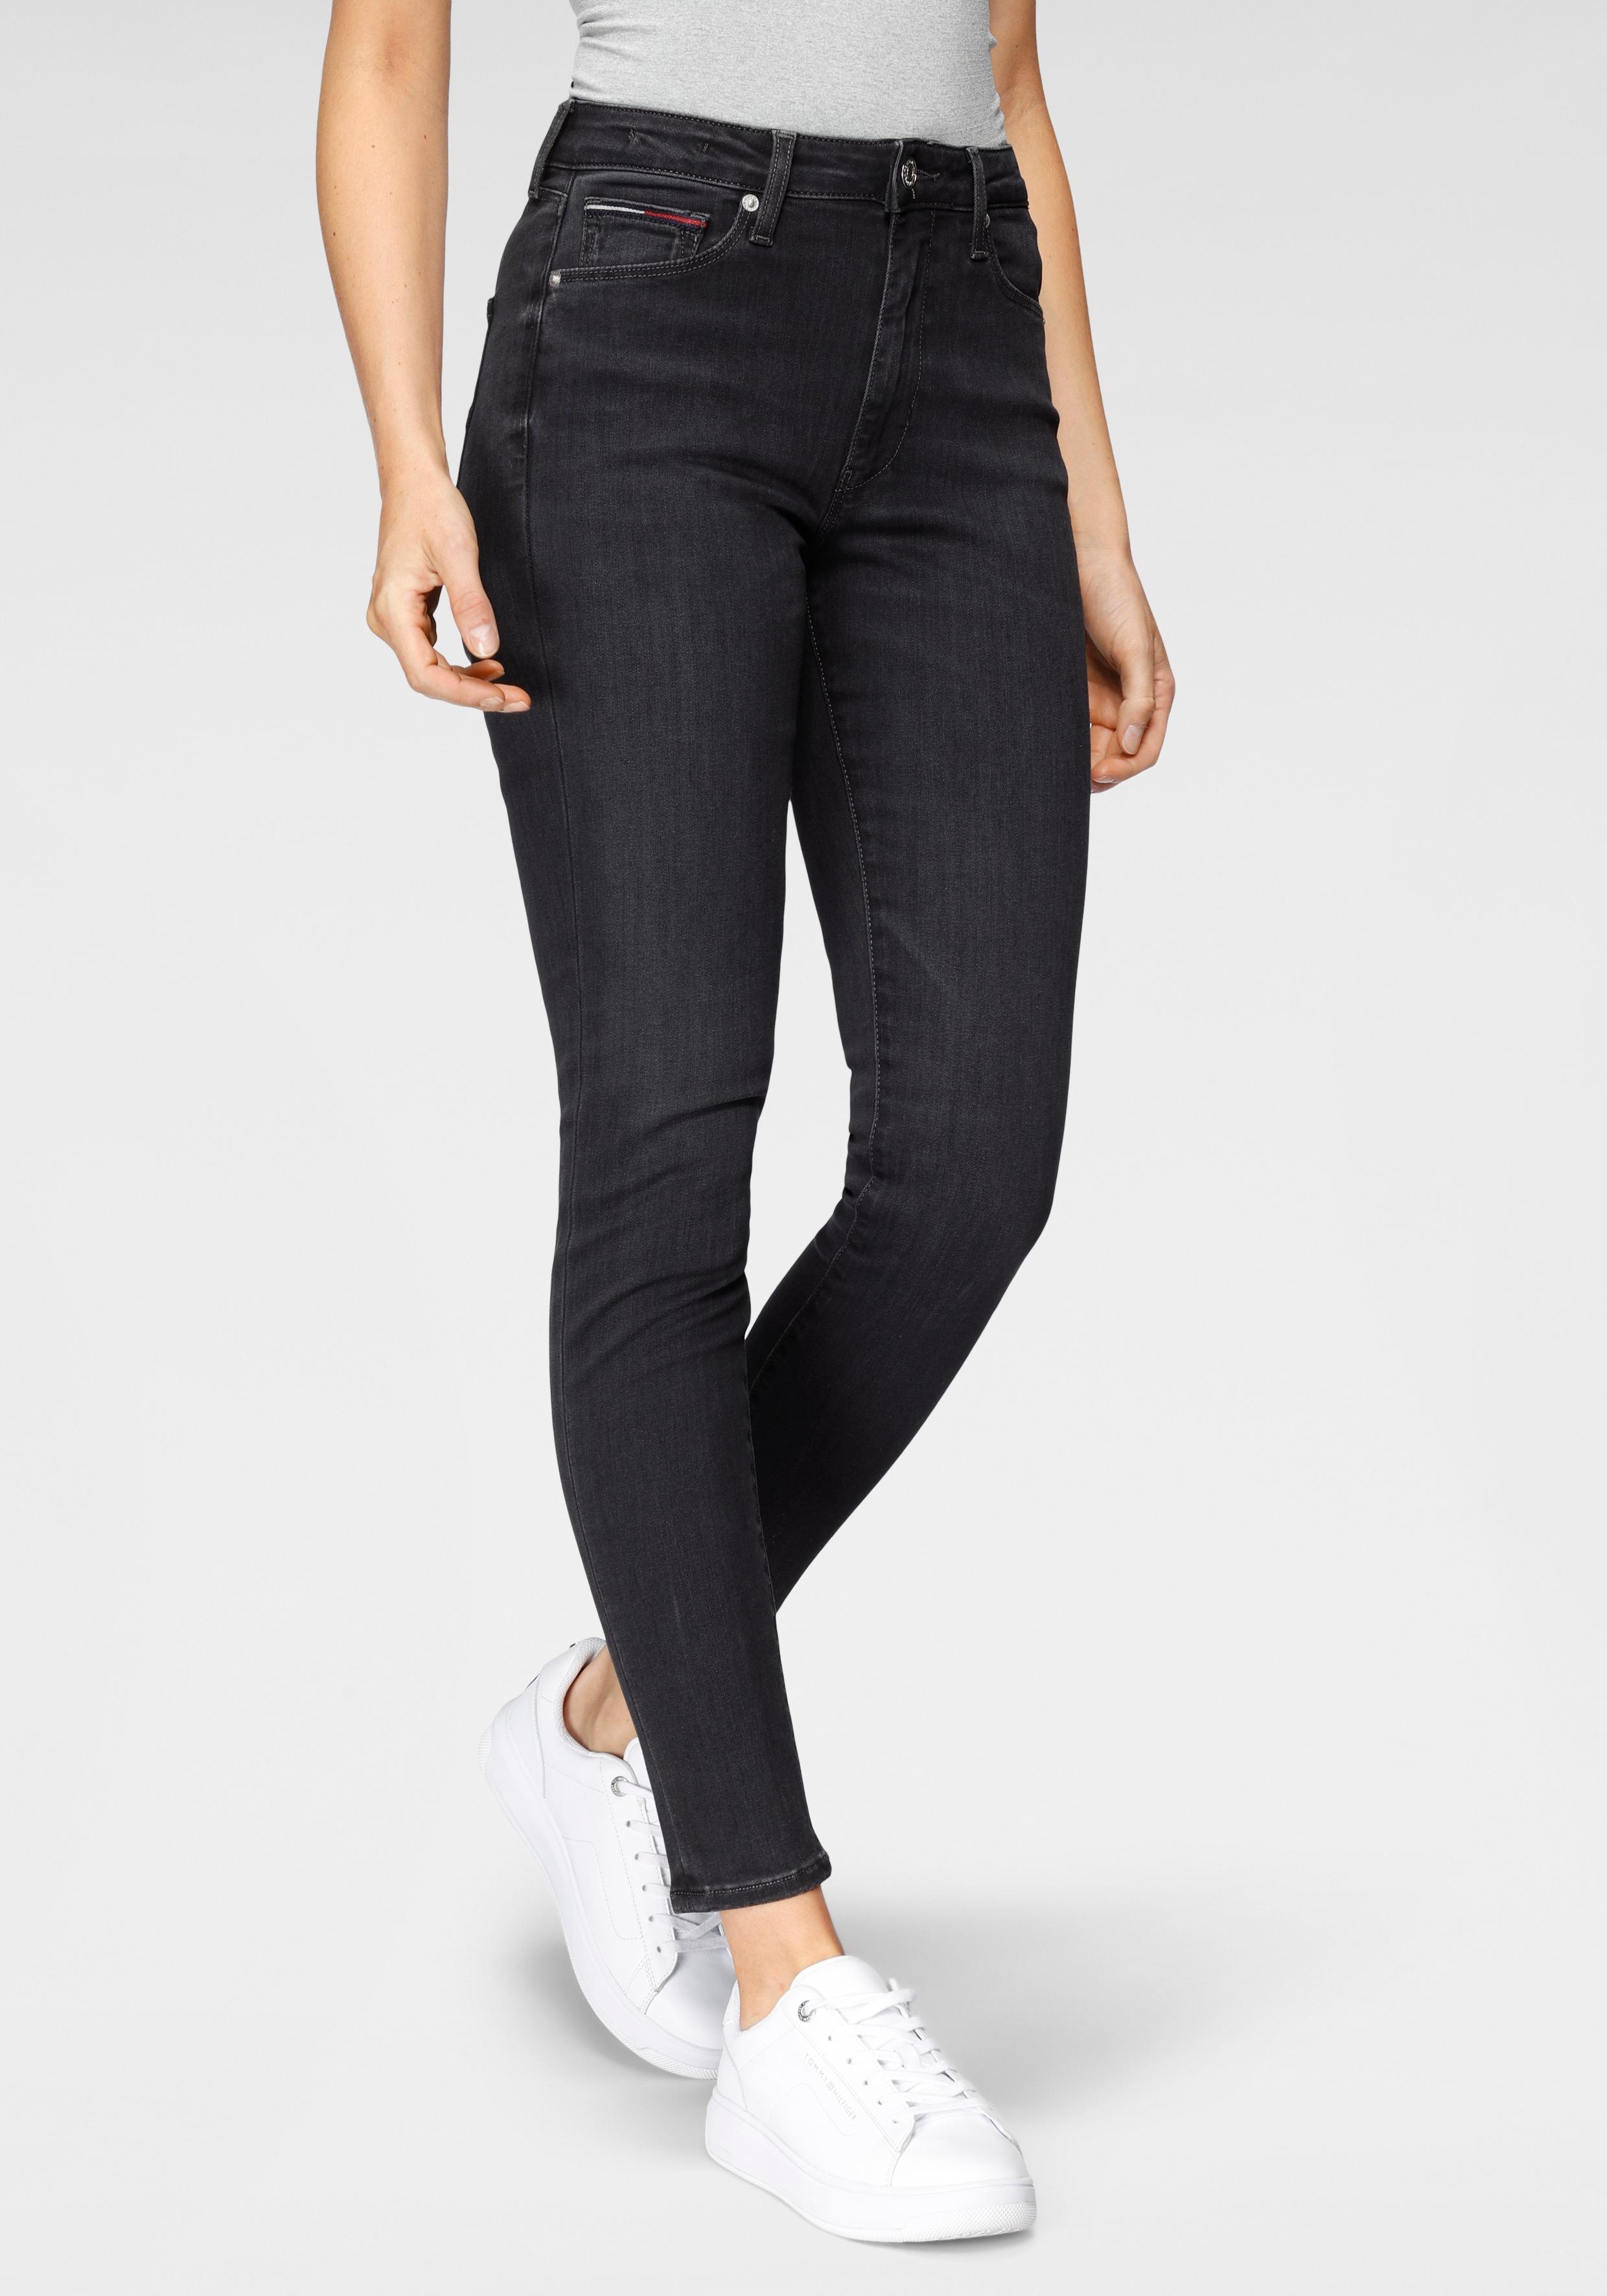 TOMMY JEANS Skinny-fit-Jeans »SYLVIA HR SUPER SKNY ANKLE ...